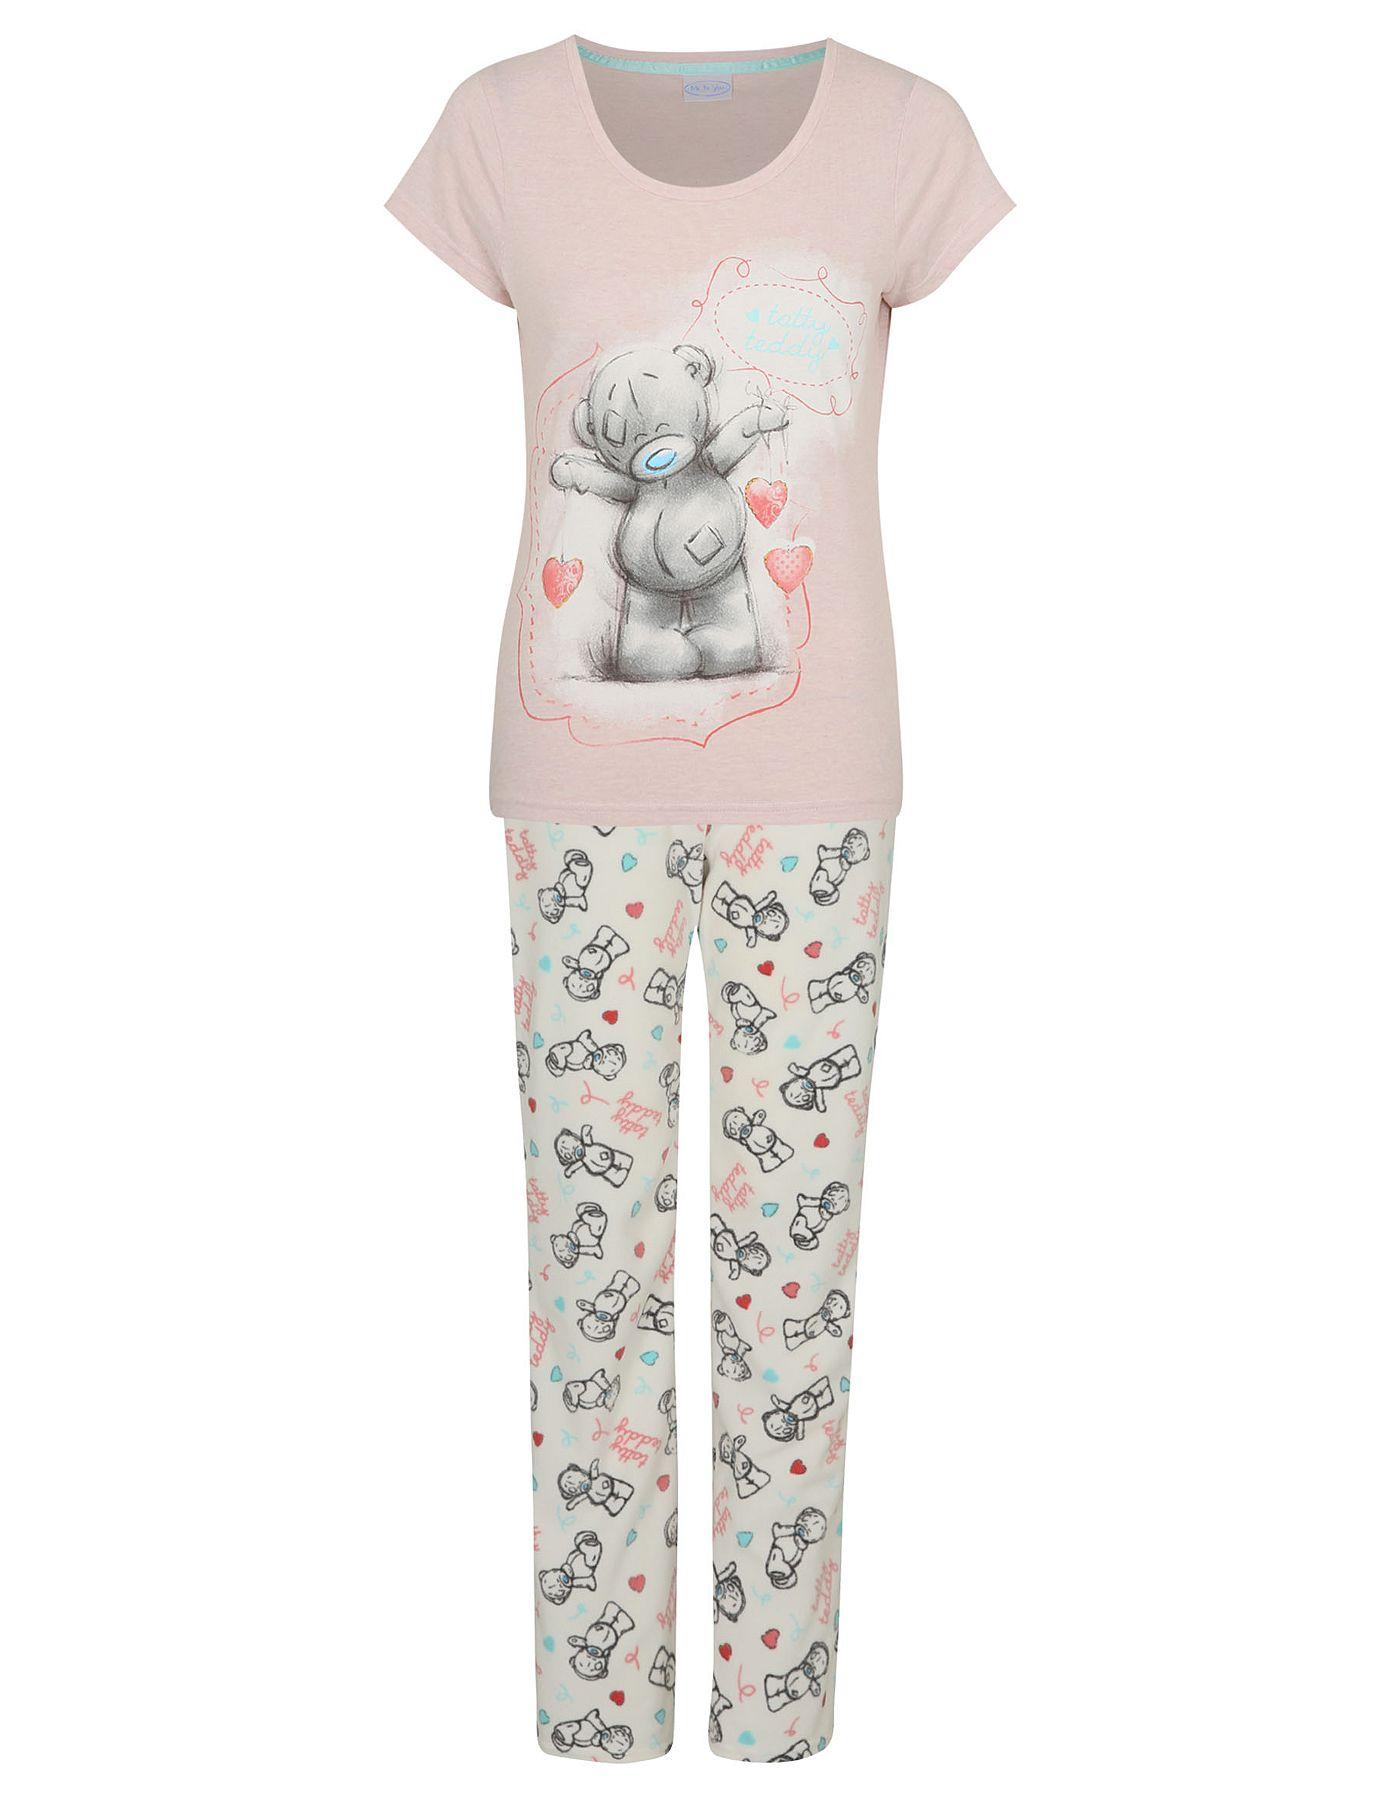 Tatty Teddy Pyjama Set | Women | George at ASDA | Ruci | Pinterest ...